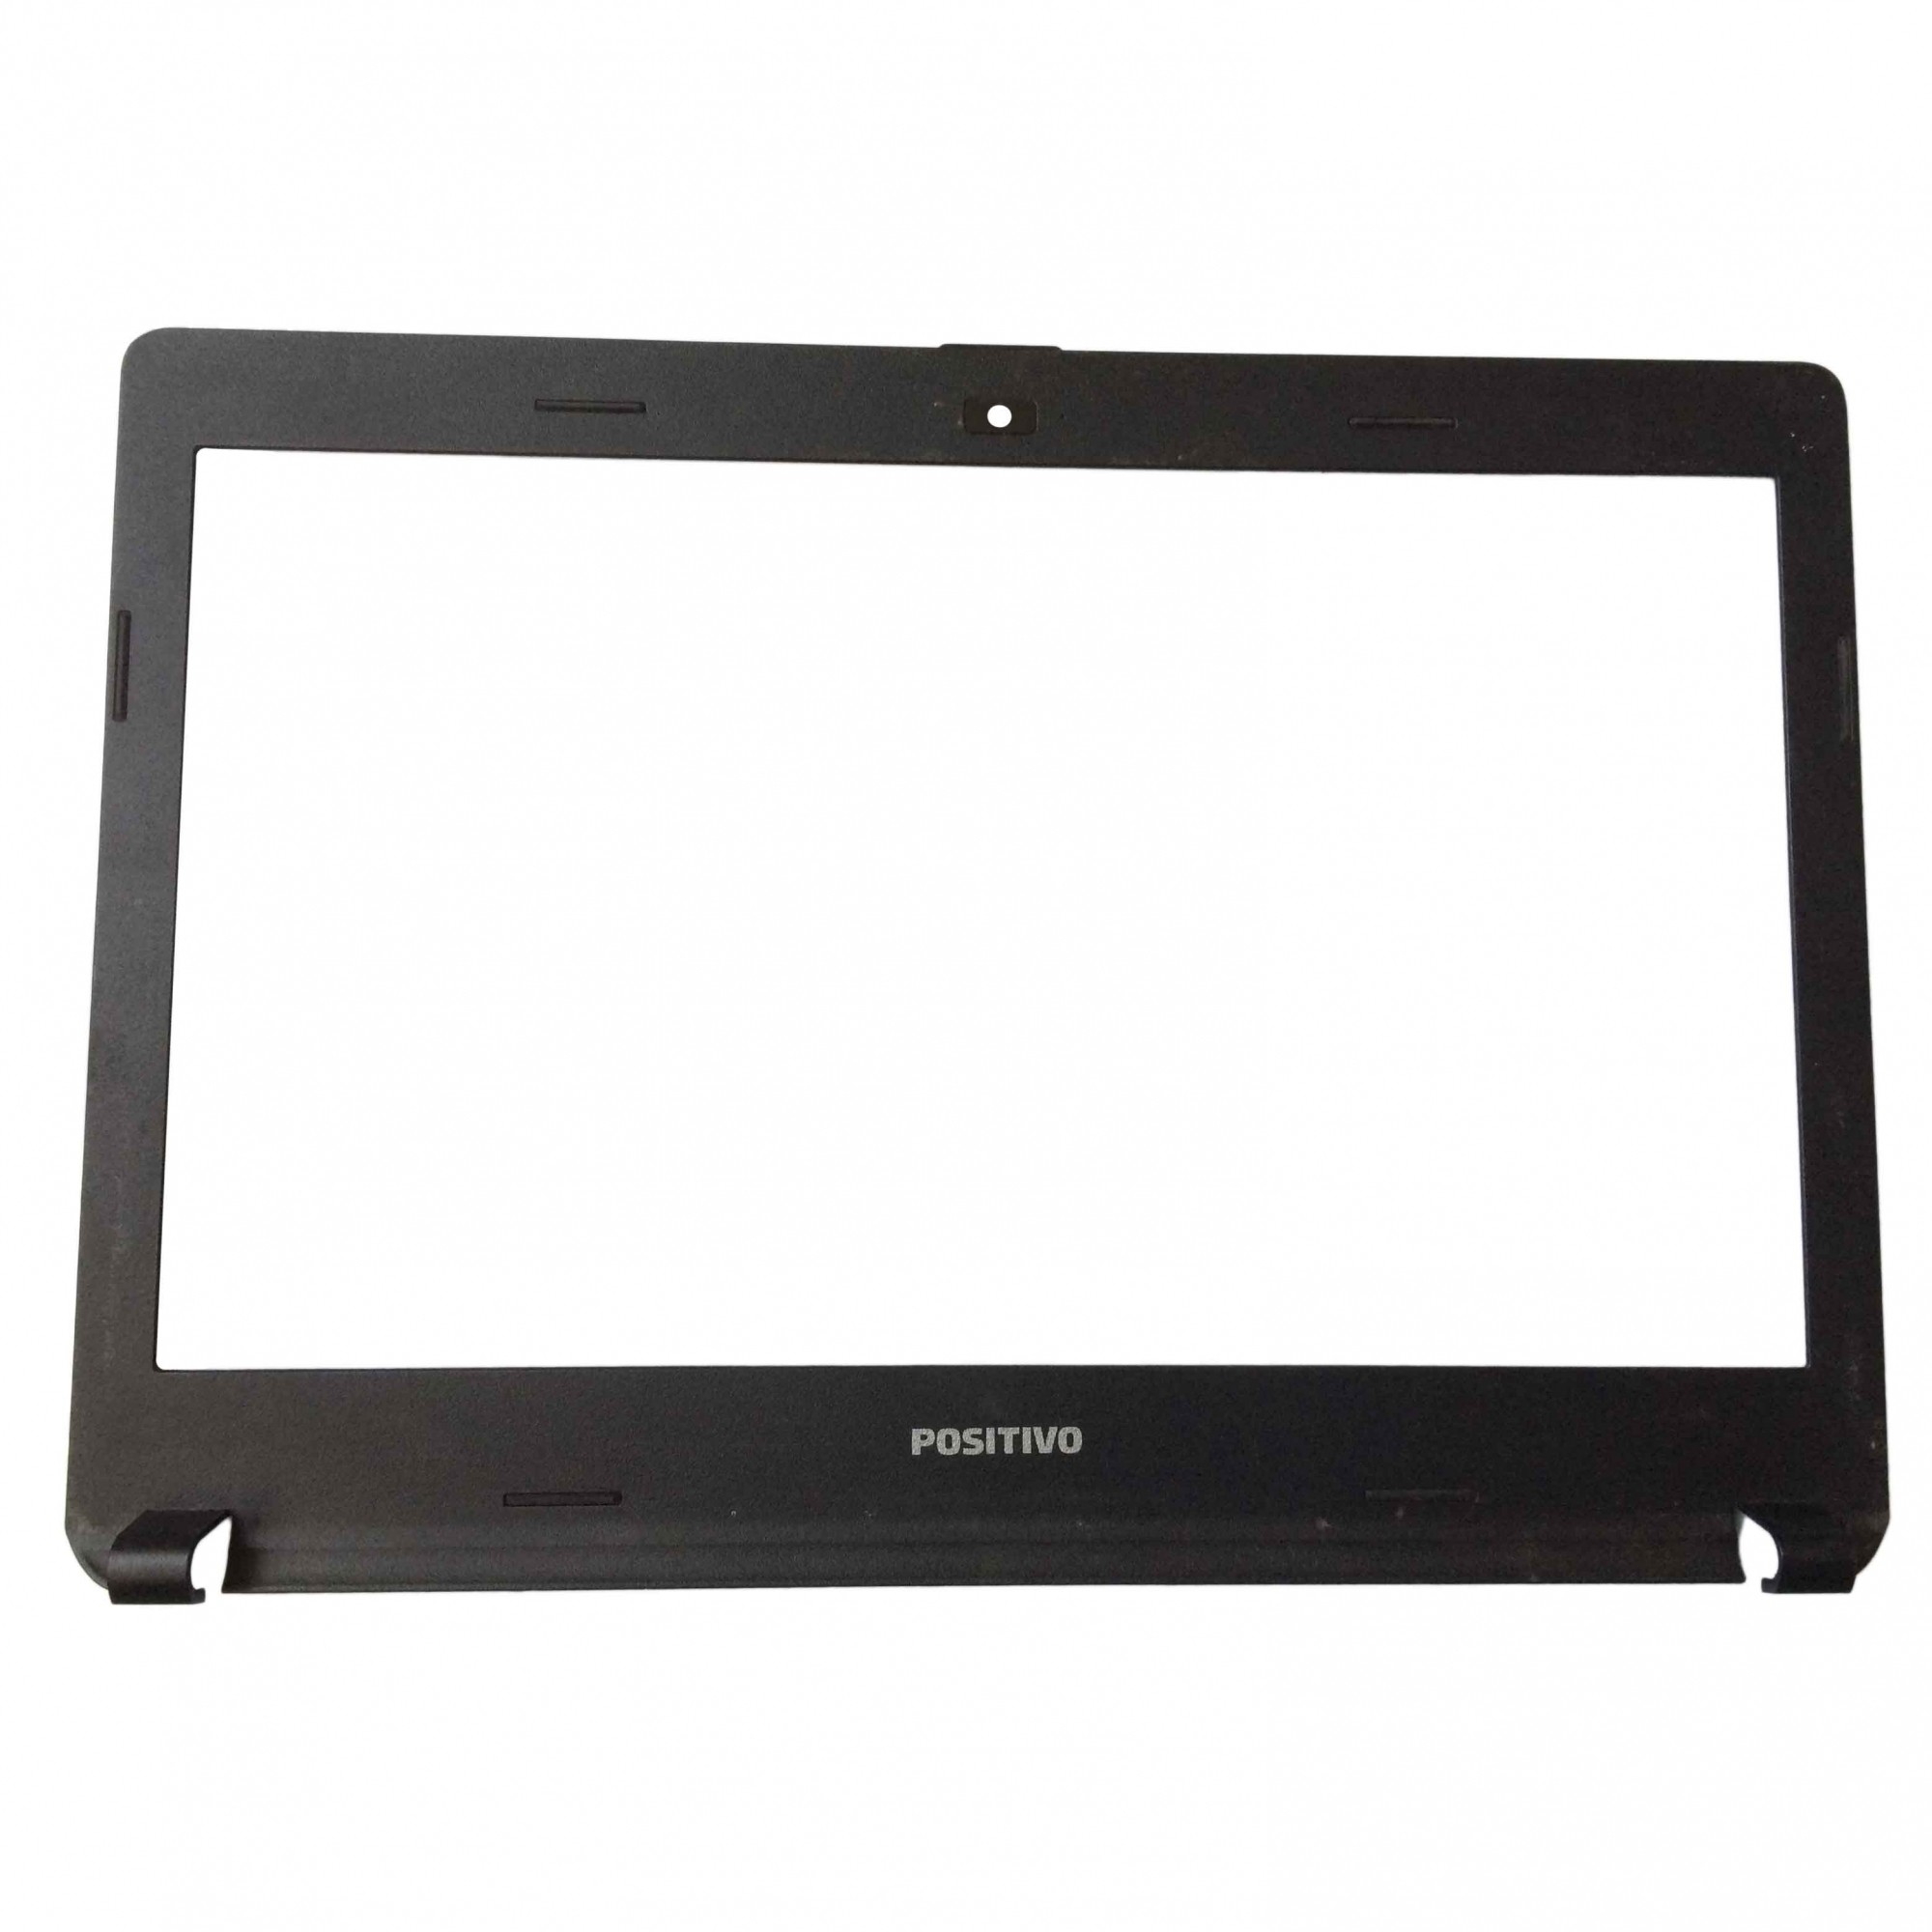 Moldura Tela LCD Notebook Positivo Xr3000 PN:62rph48b11-0201 - Retirado